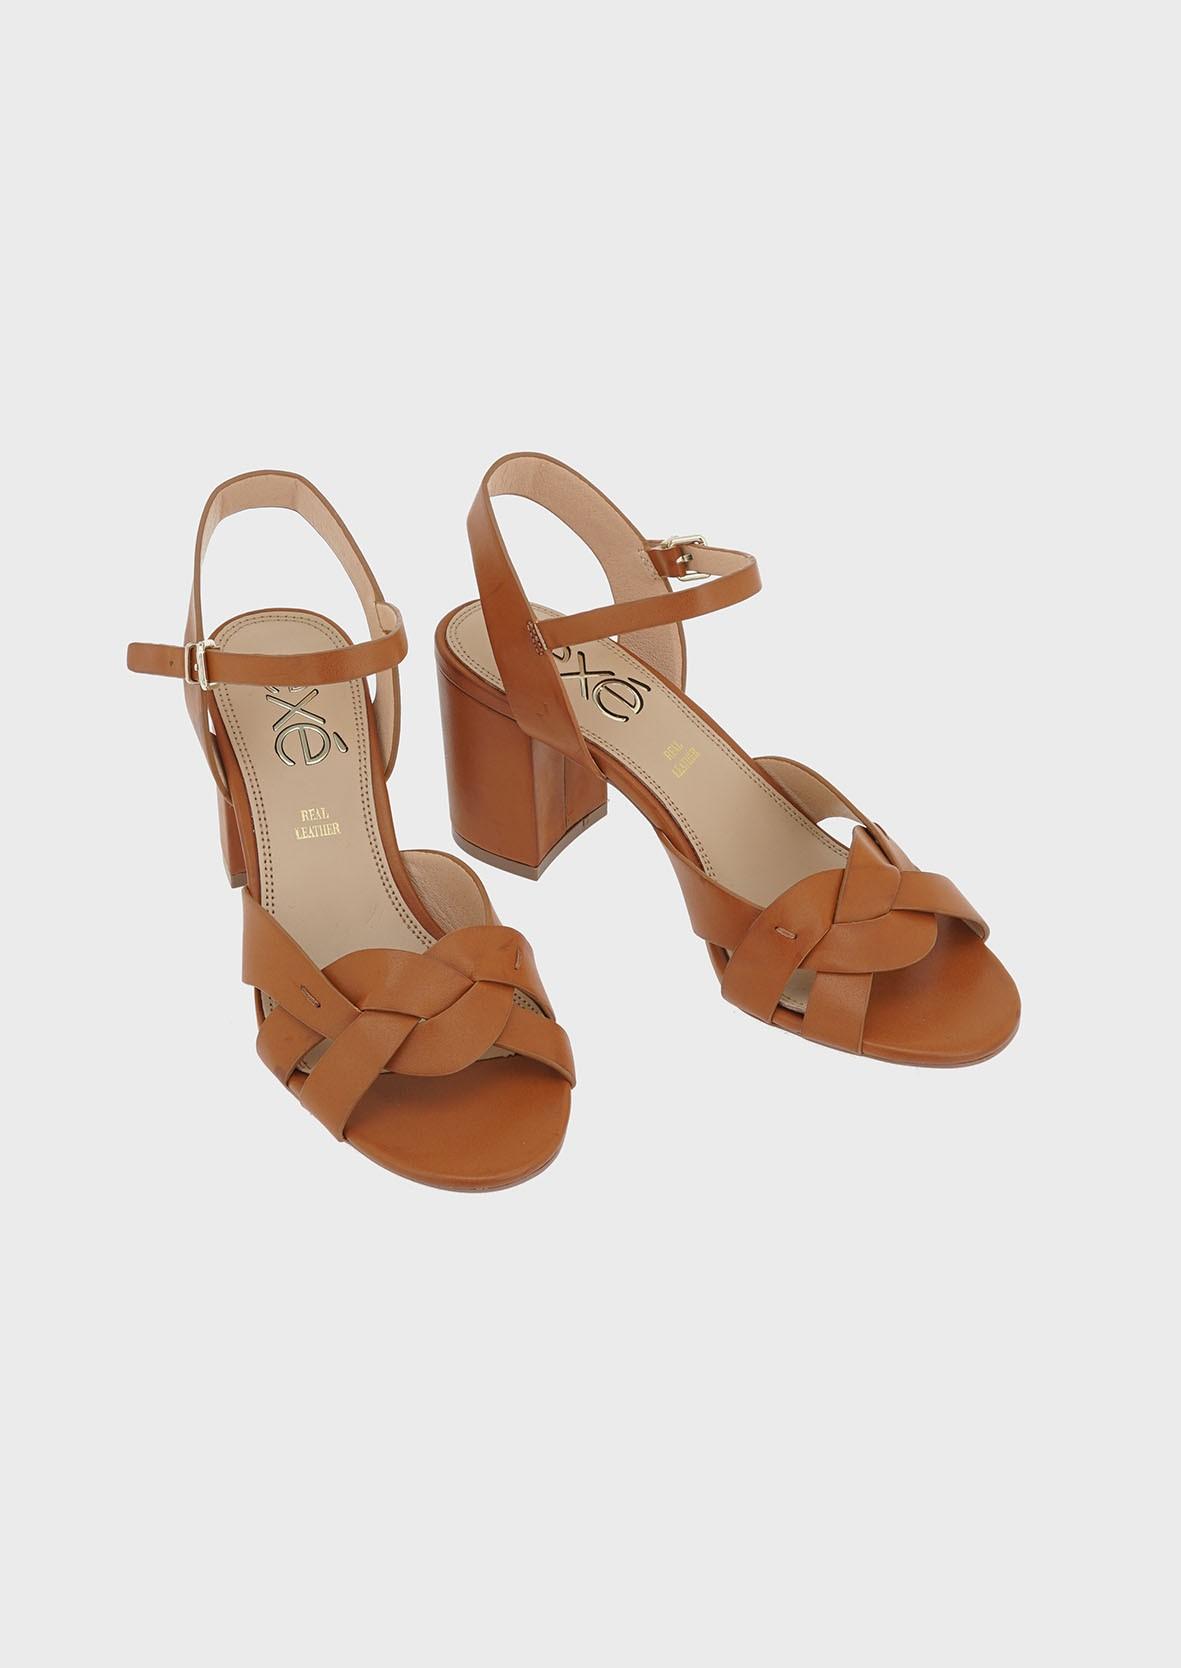 EXE Shoes Πέδιλα Γυναικεία ADELE-267 Ταμπά M47002674531